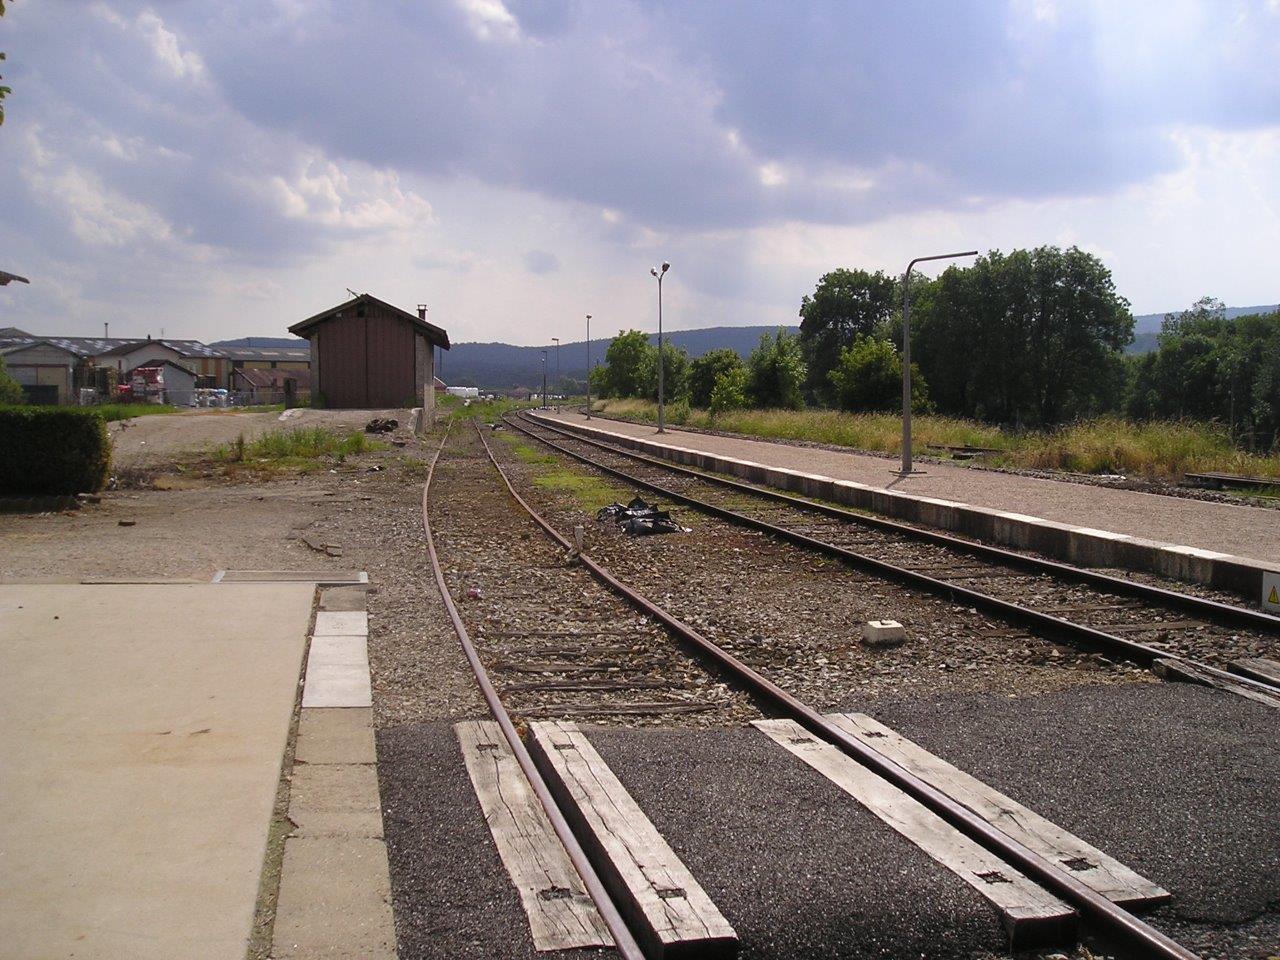 gare-de-villereversure-train-station